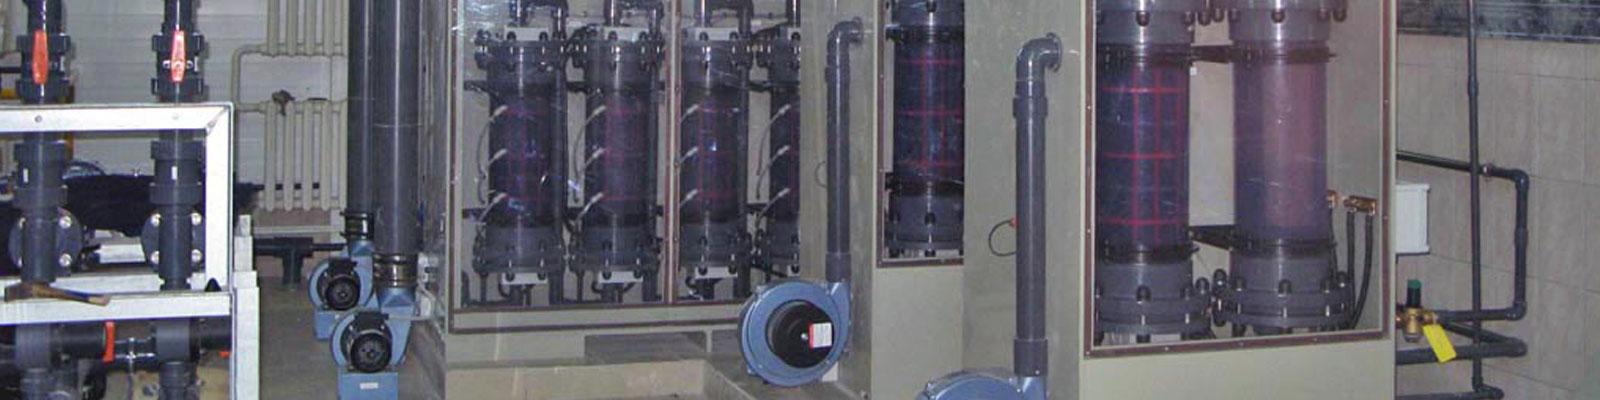 Electrochlorination